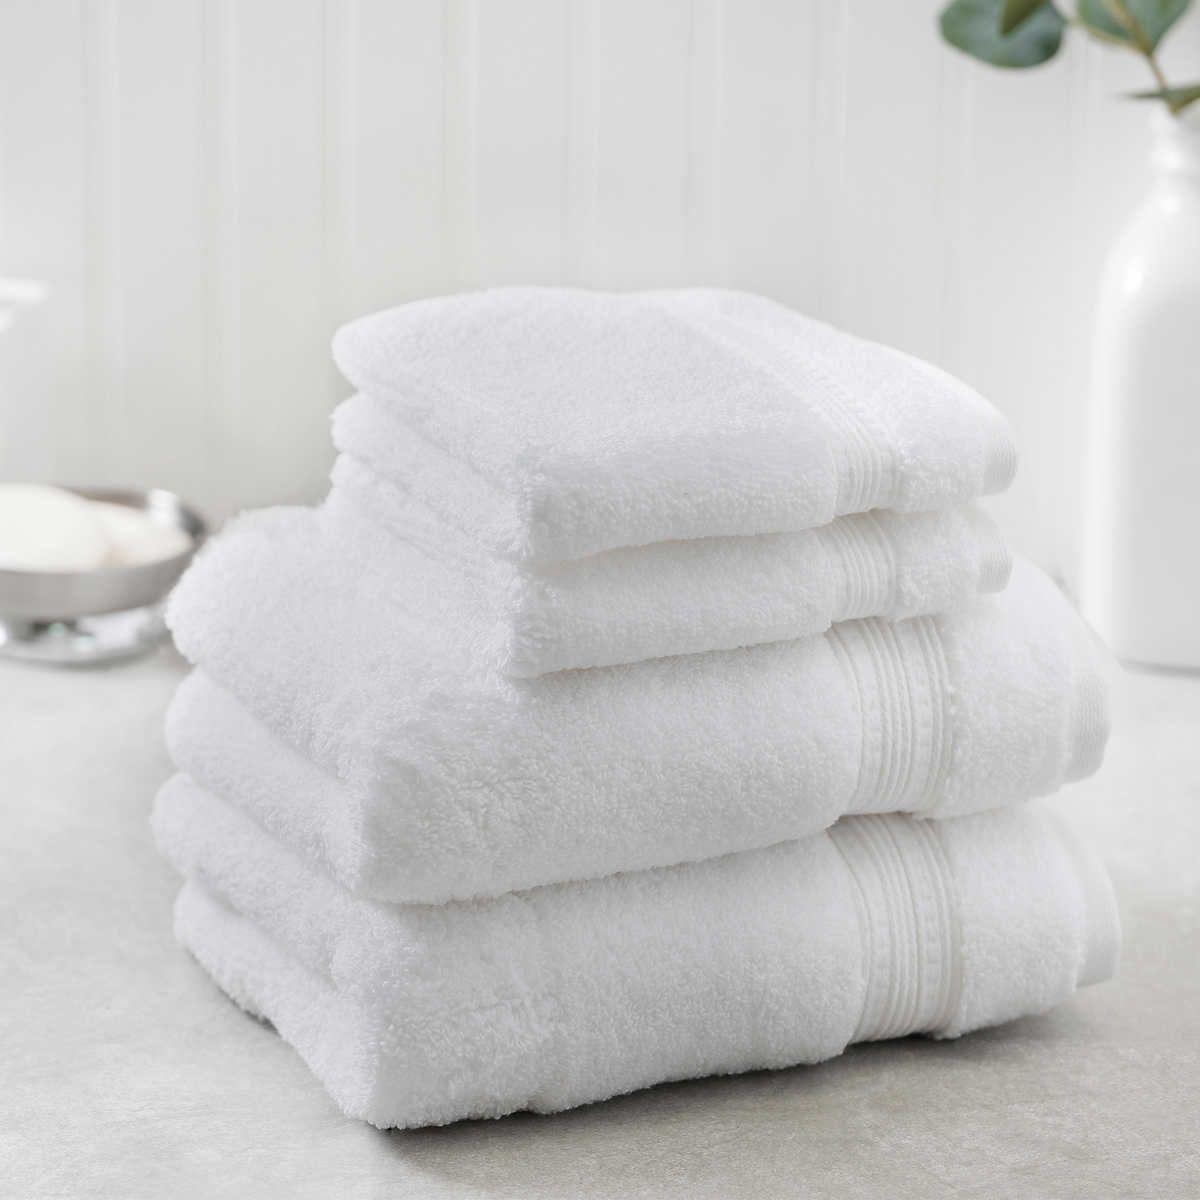 Charisma 100 Hygrocotton 4 Piece Hand And Washcloth Towel Set